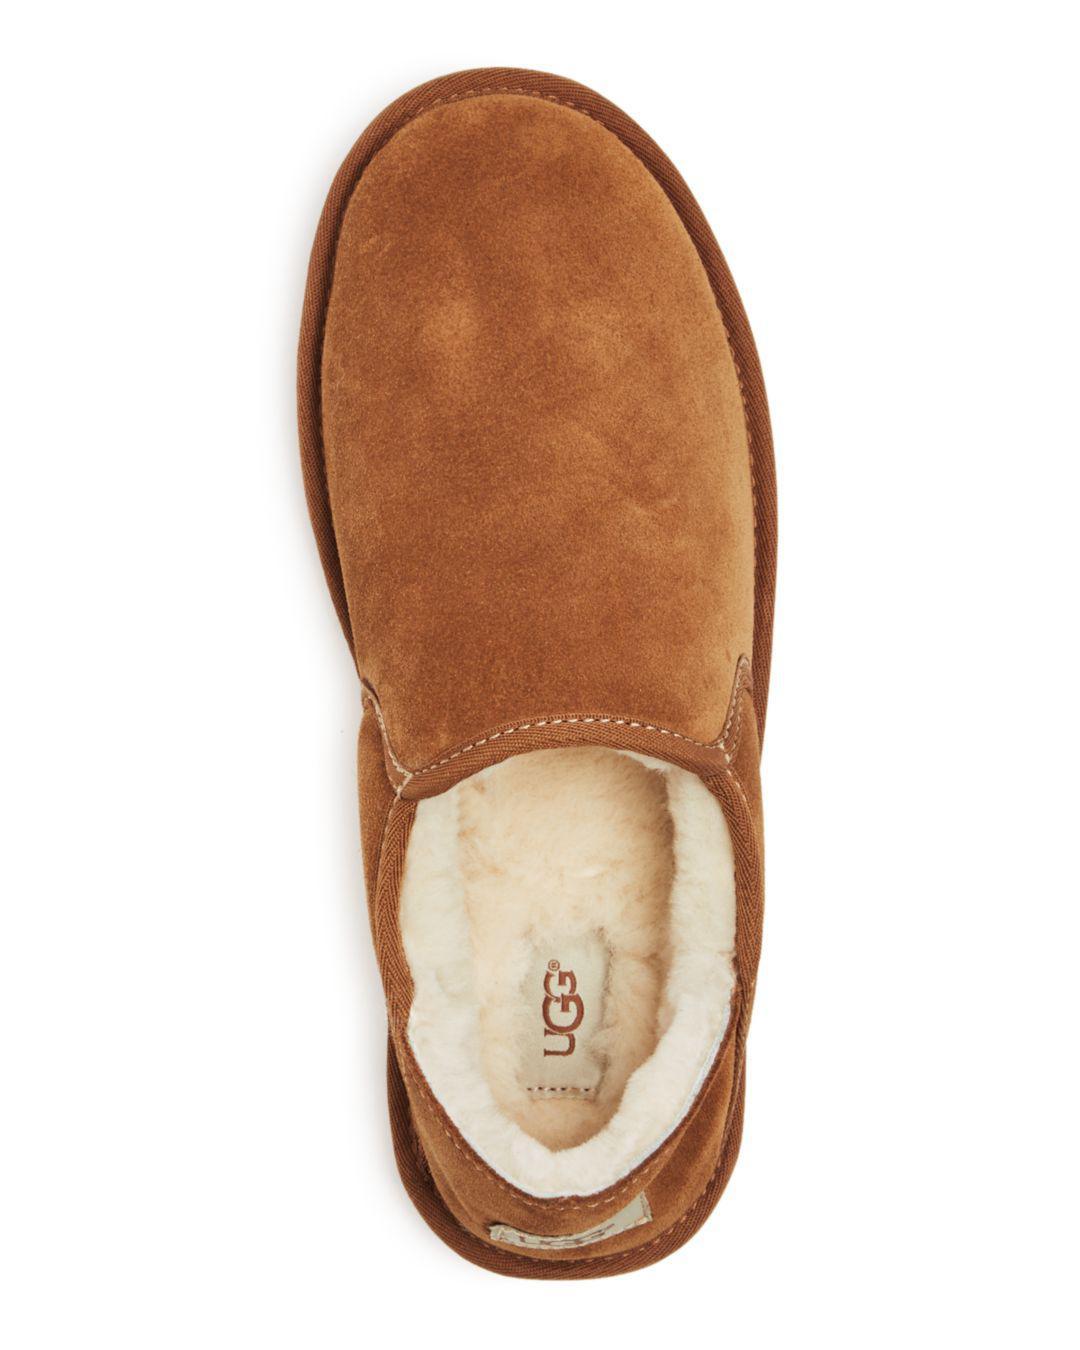 2fe0377b0411 Lyst - UGG Men s Kenton Shearling Slippers in Brown for Men